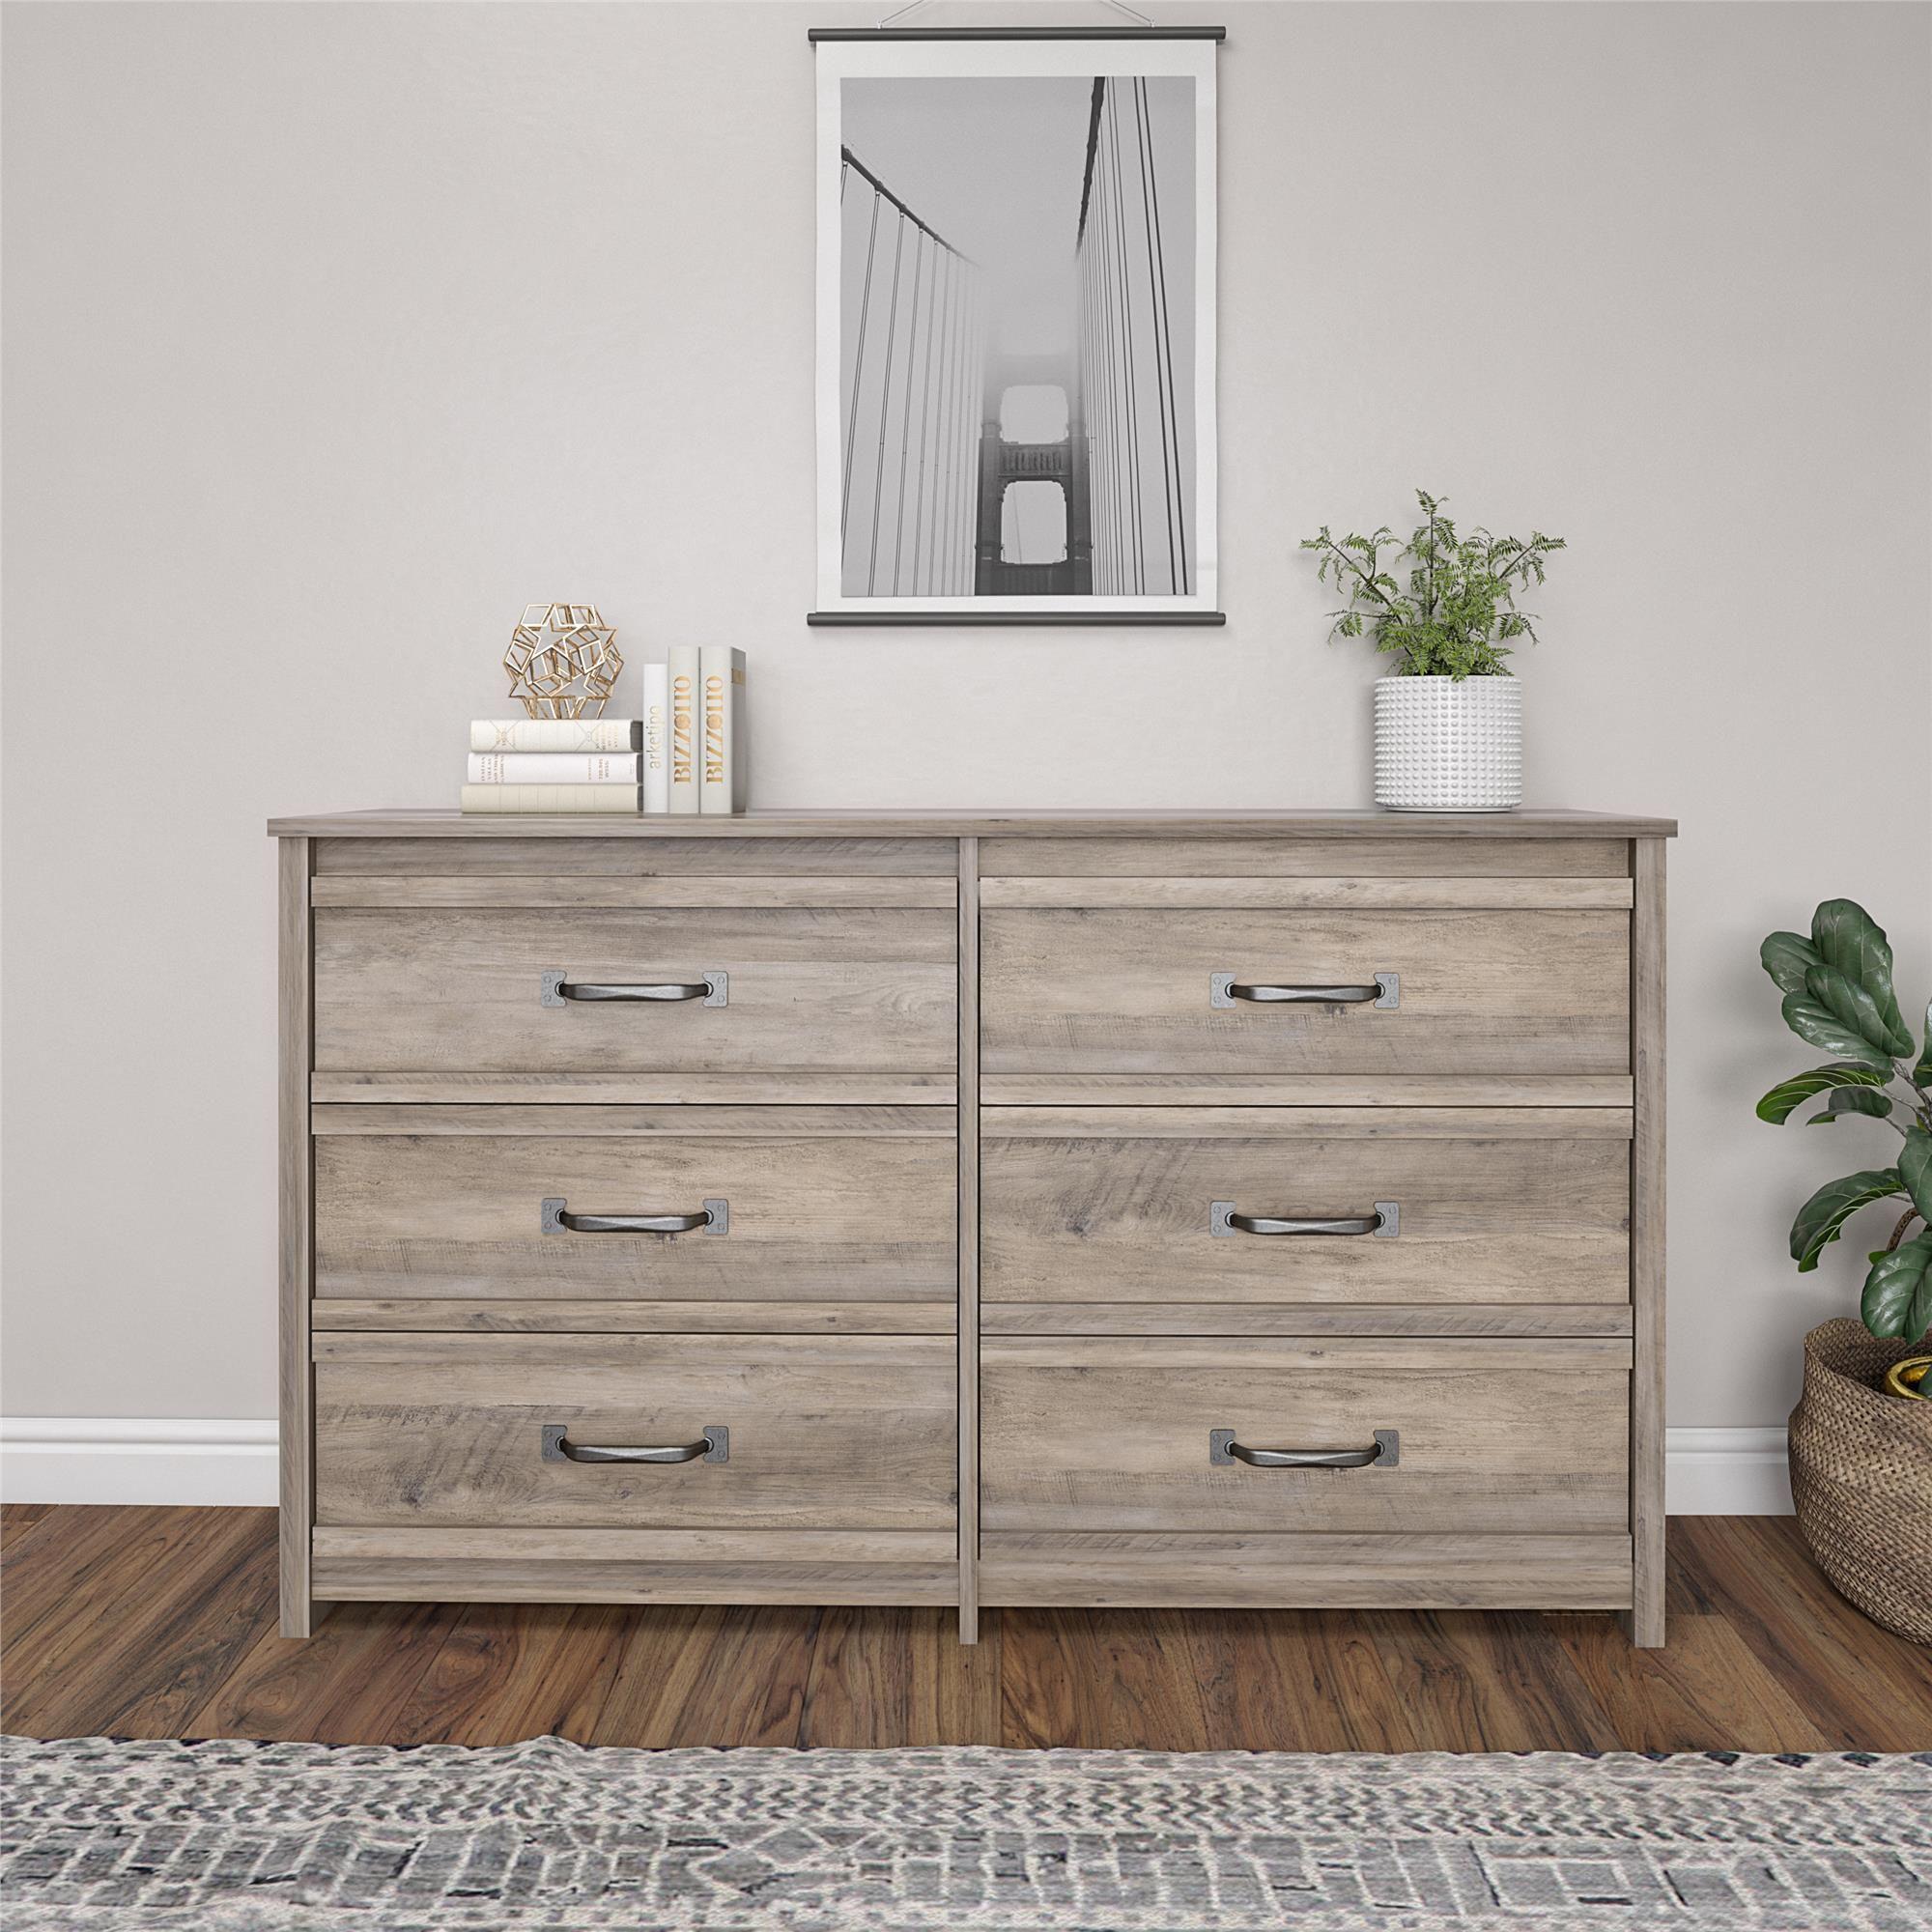 Better homes gardens rustic ranch 6 drawer dresser gray